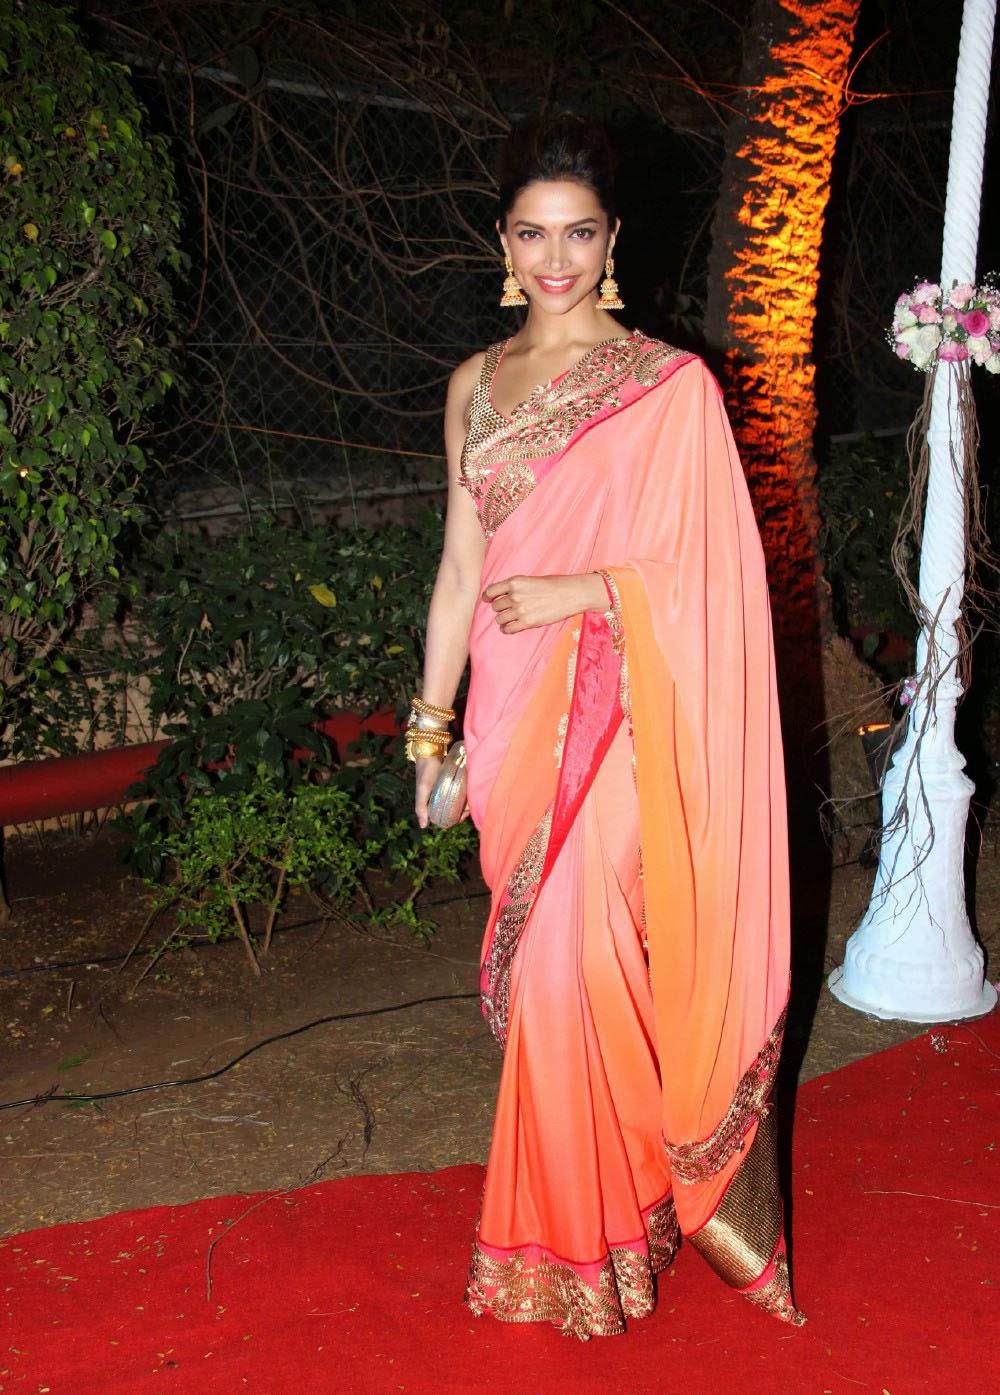 Deepika Padukone At Ahana Deol's Wedding Reception